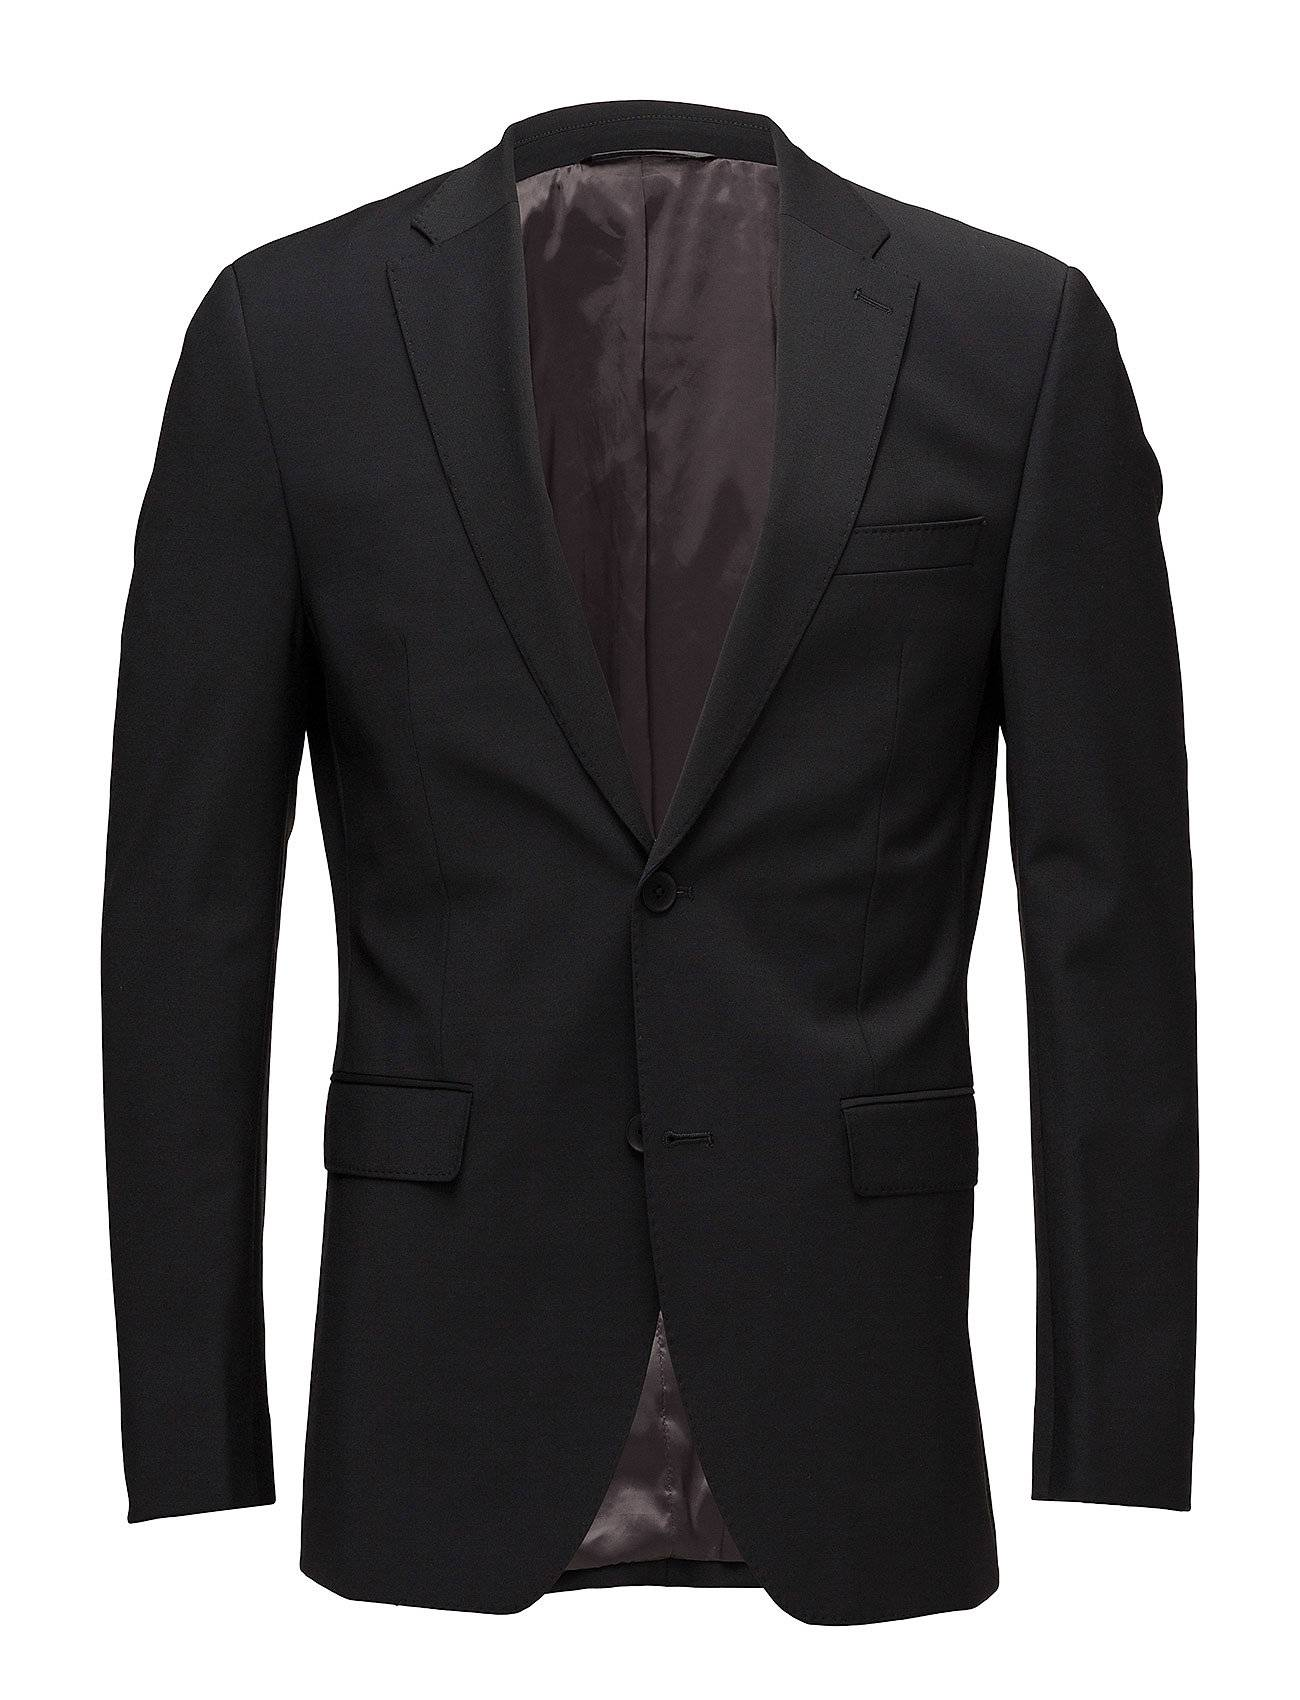 Image of Esprit Collection Blazers Suit Bleiseri Puvun Takki Musta Esprit Collection